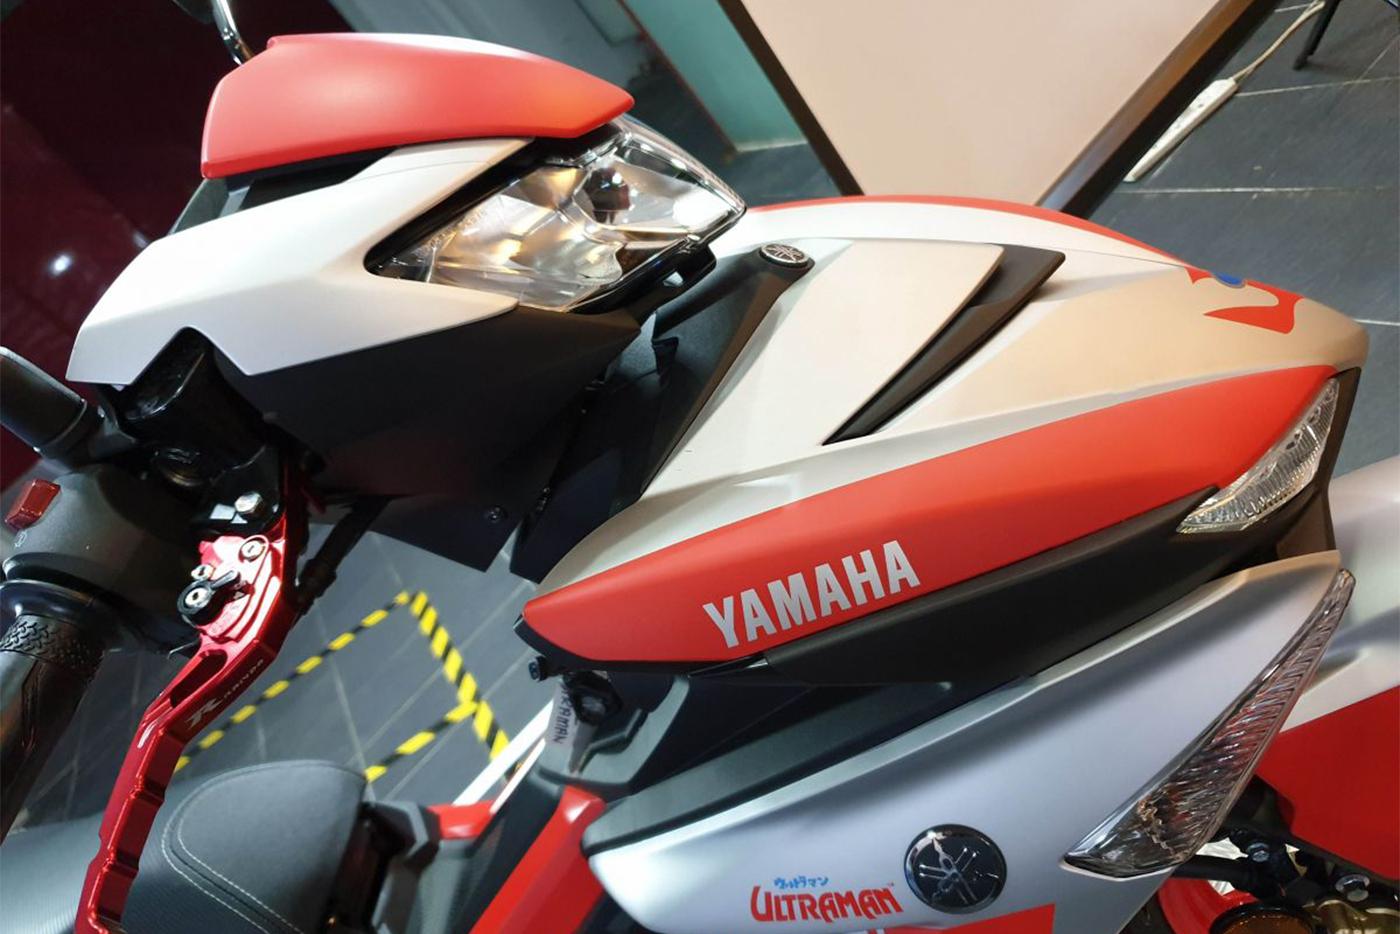 2019-yamaha-y15zr-ultraman-limited-edition-18-1200x900.jpg